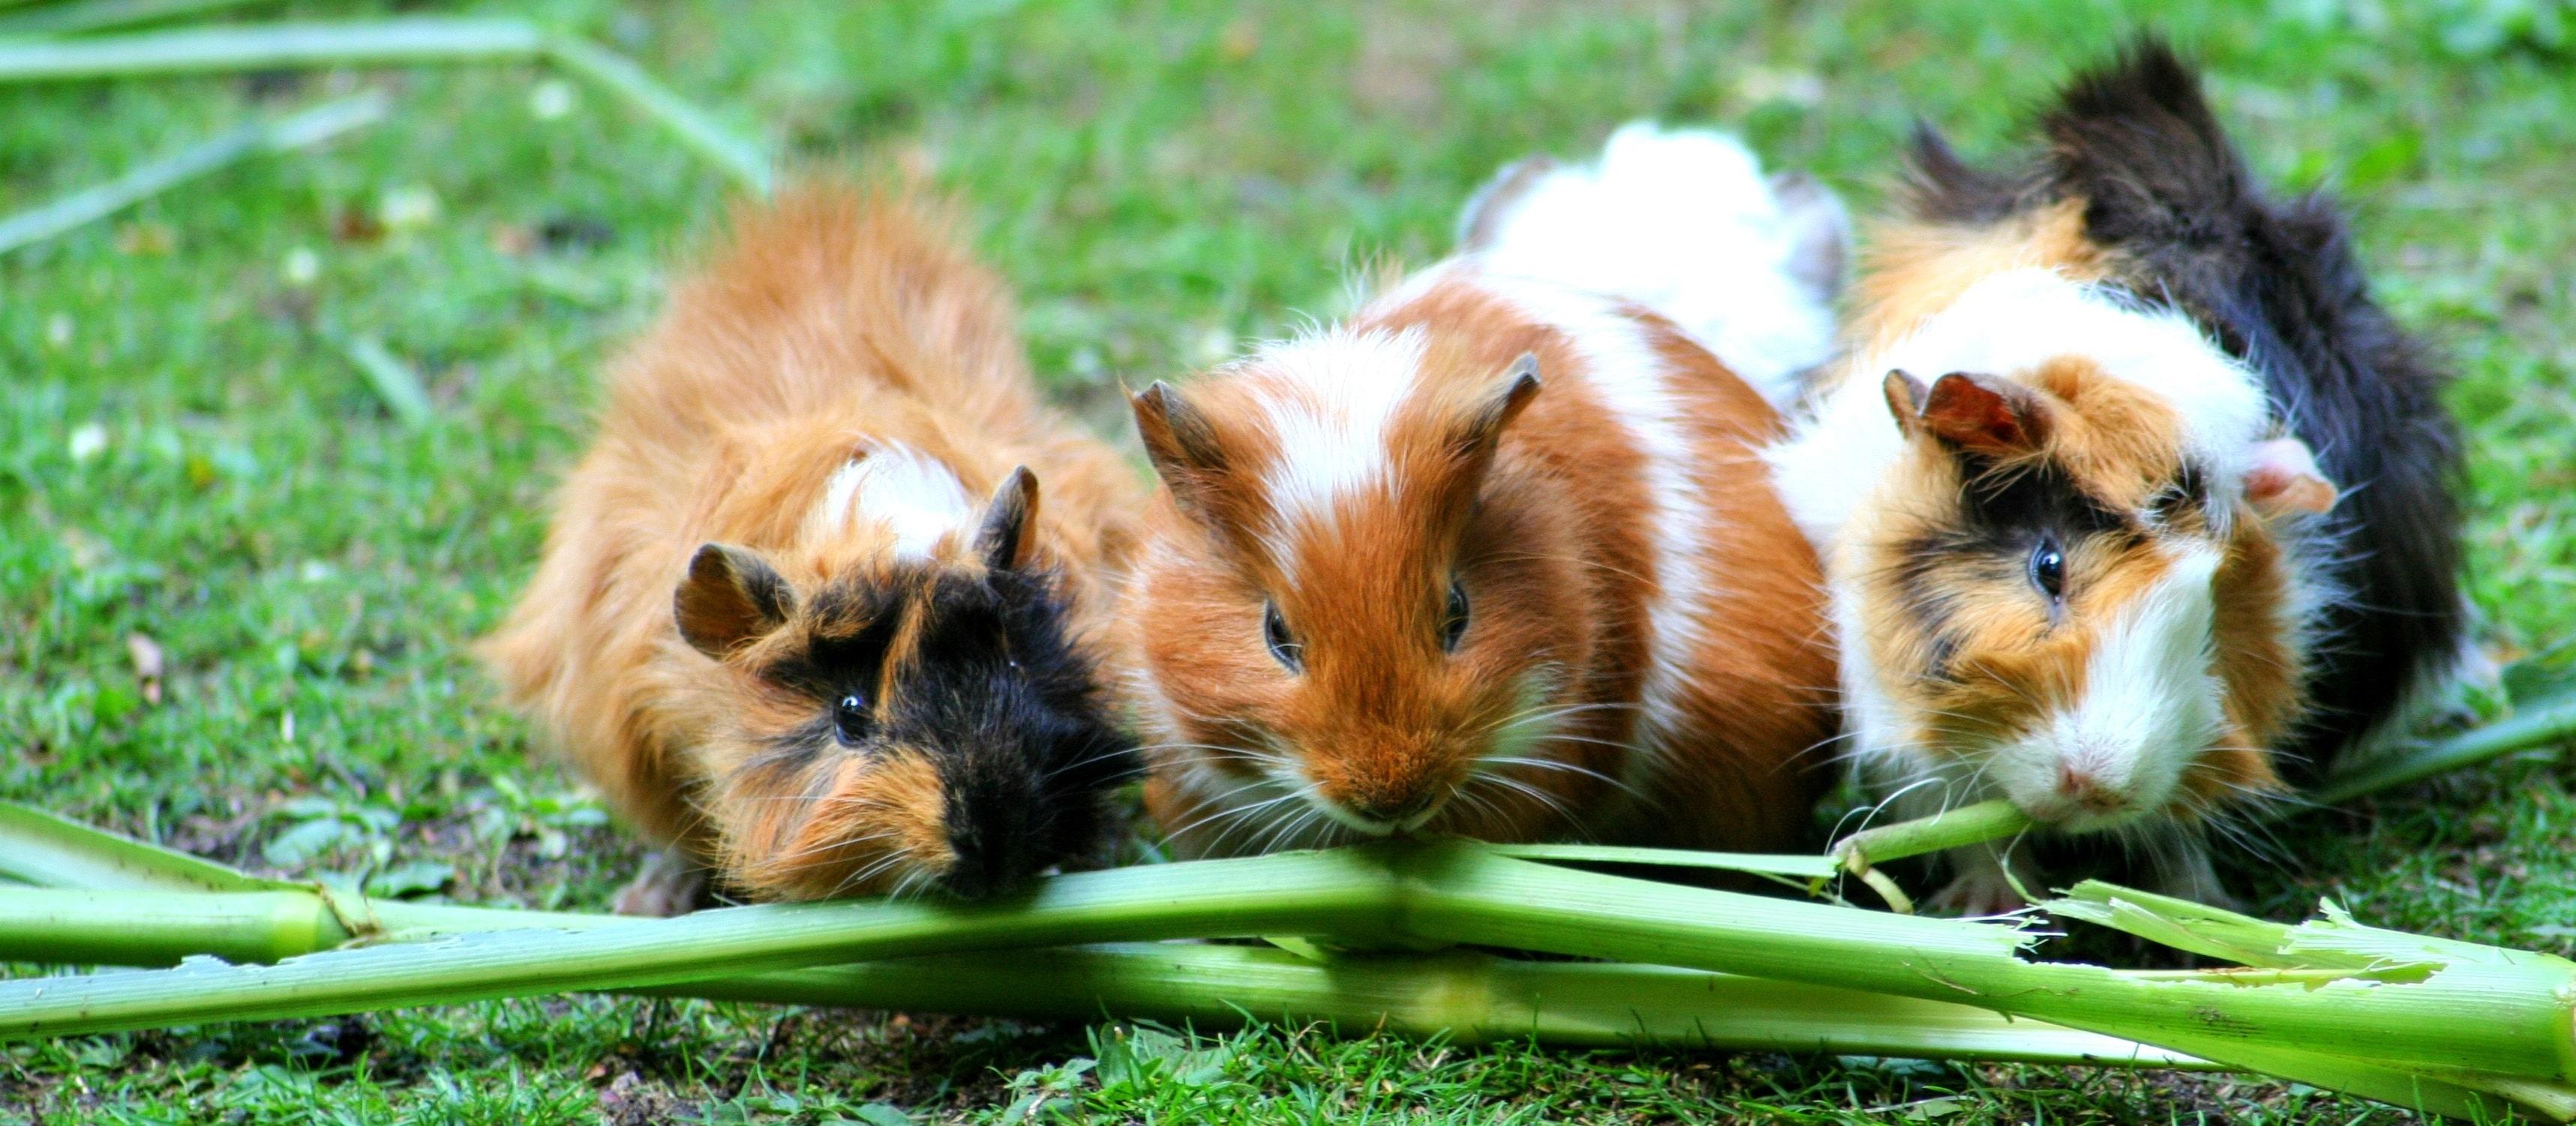 how to care for a guinea pig